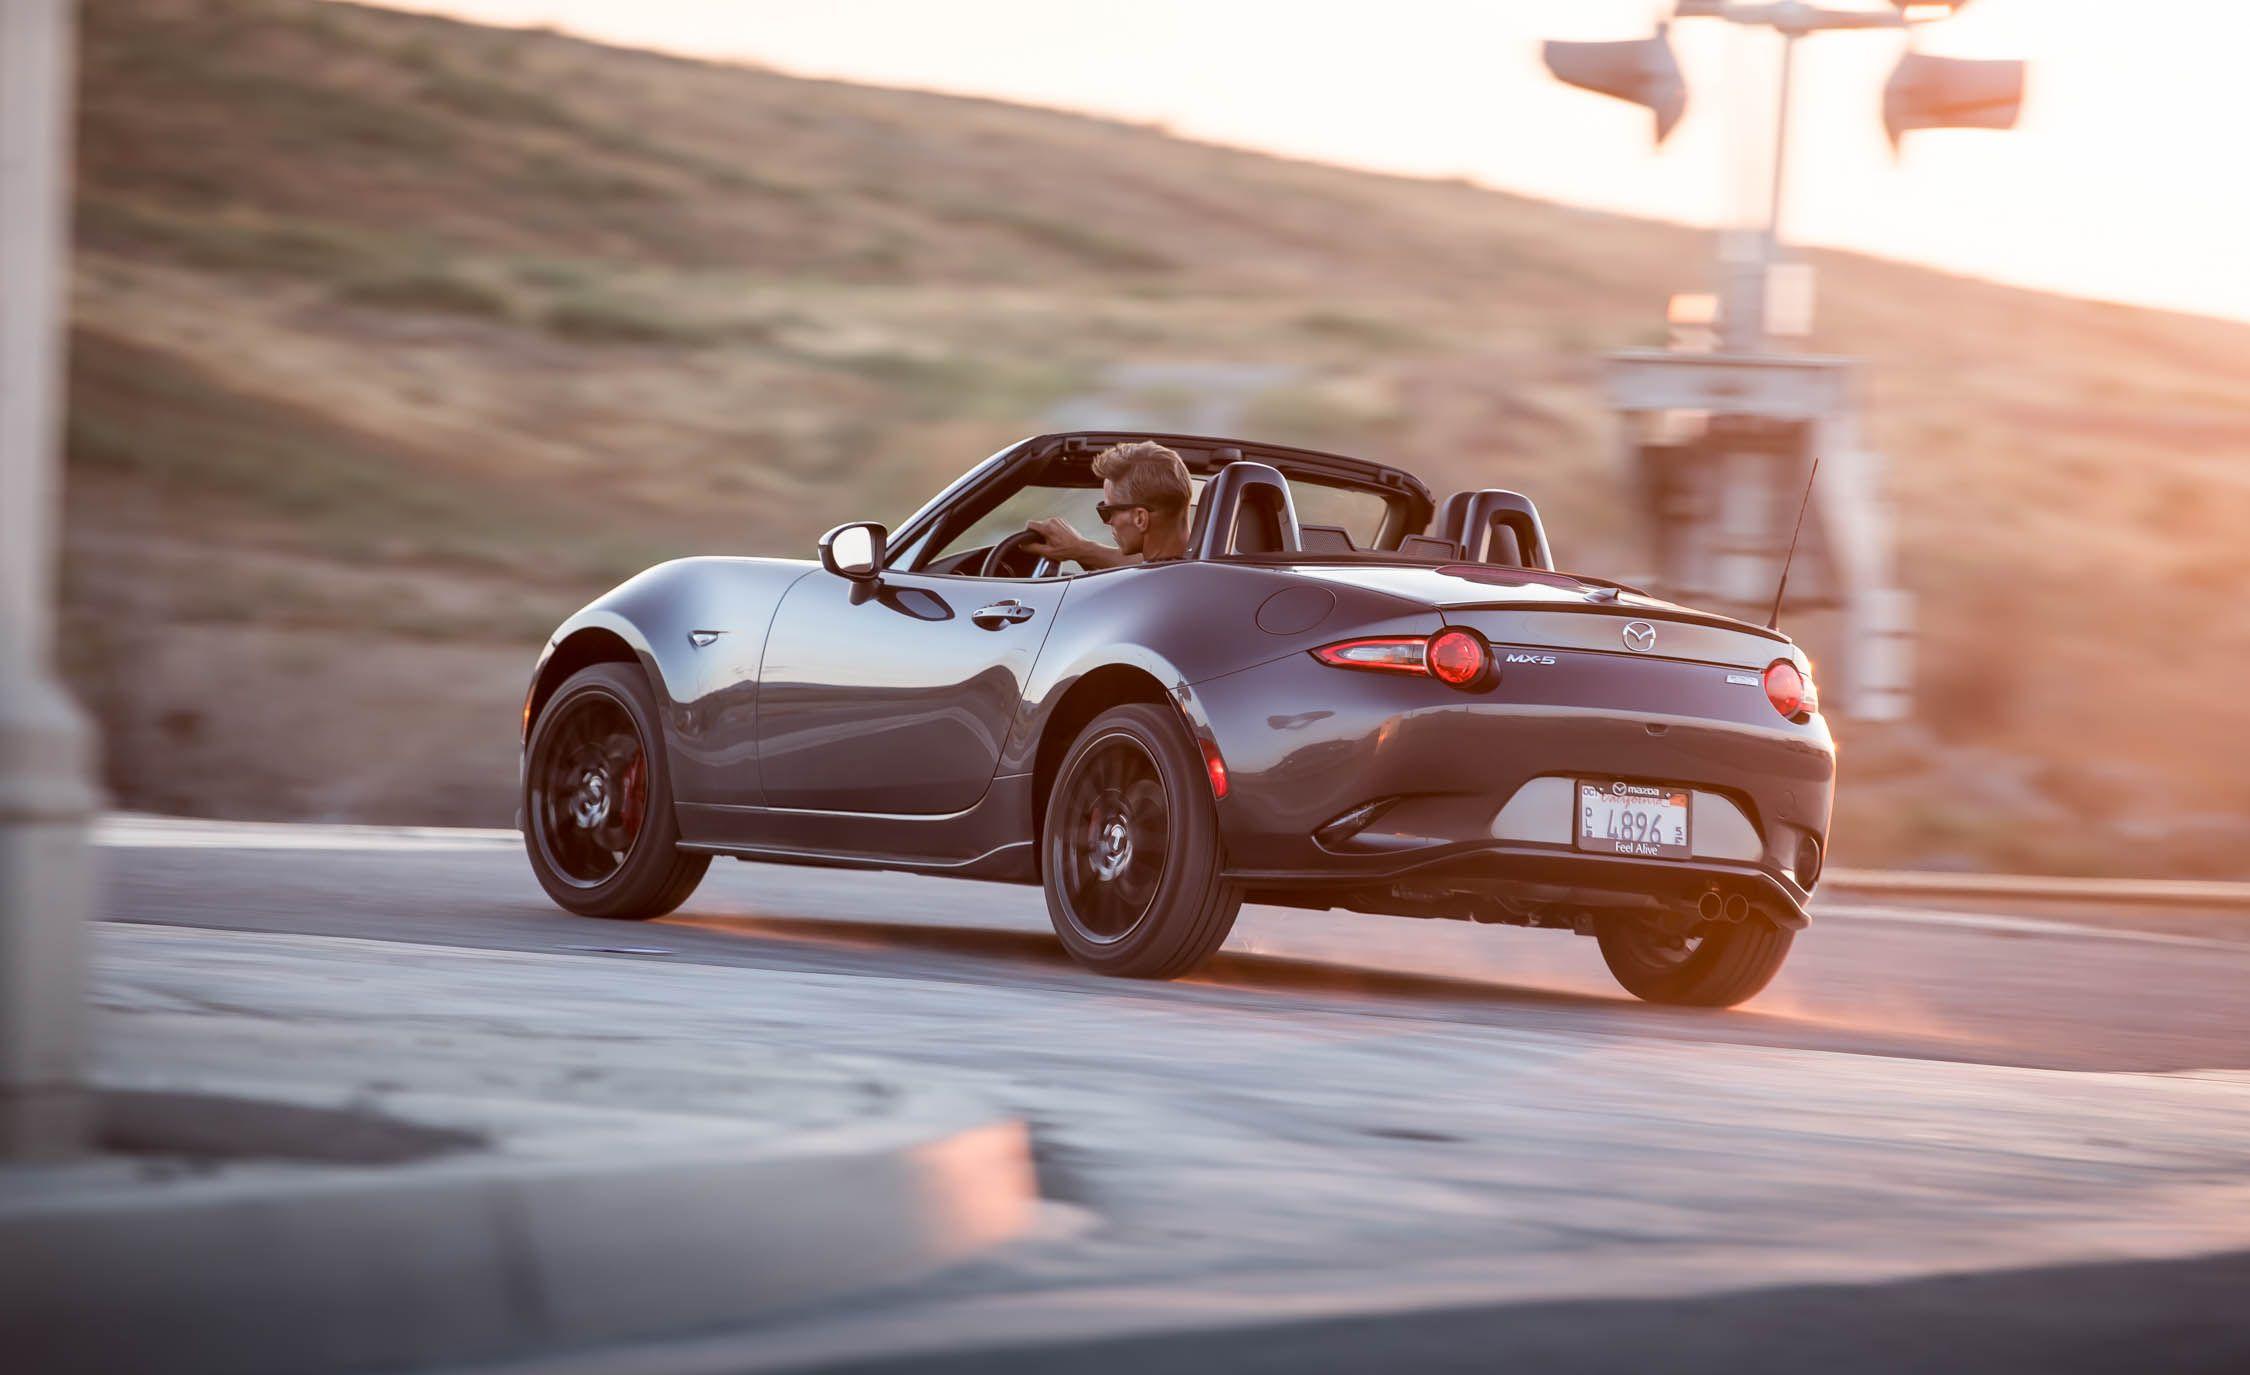 2019 Mazda Mx 5 Miata Changes To The Definitive Sports Car Make It Even Better